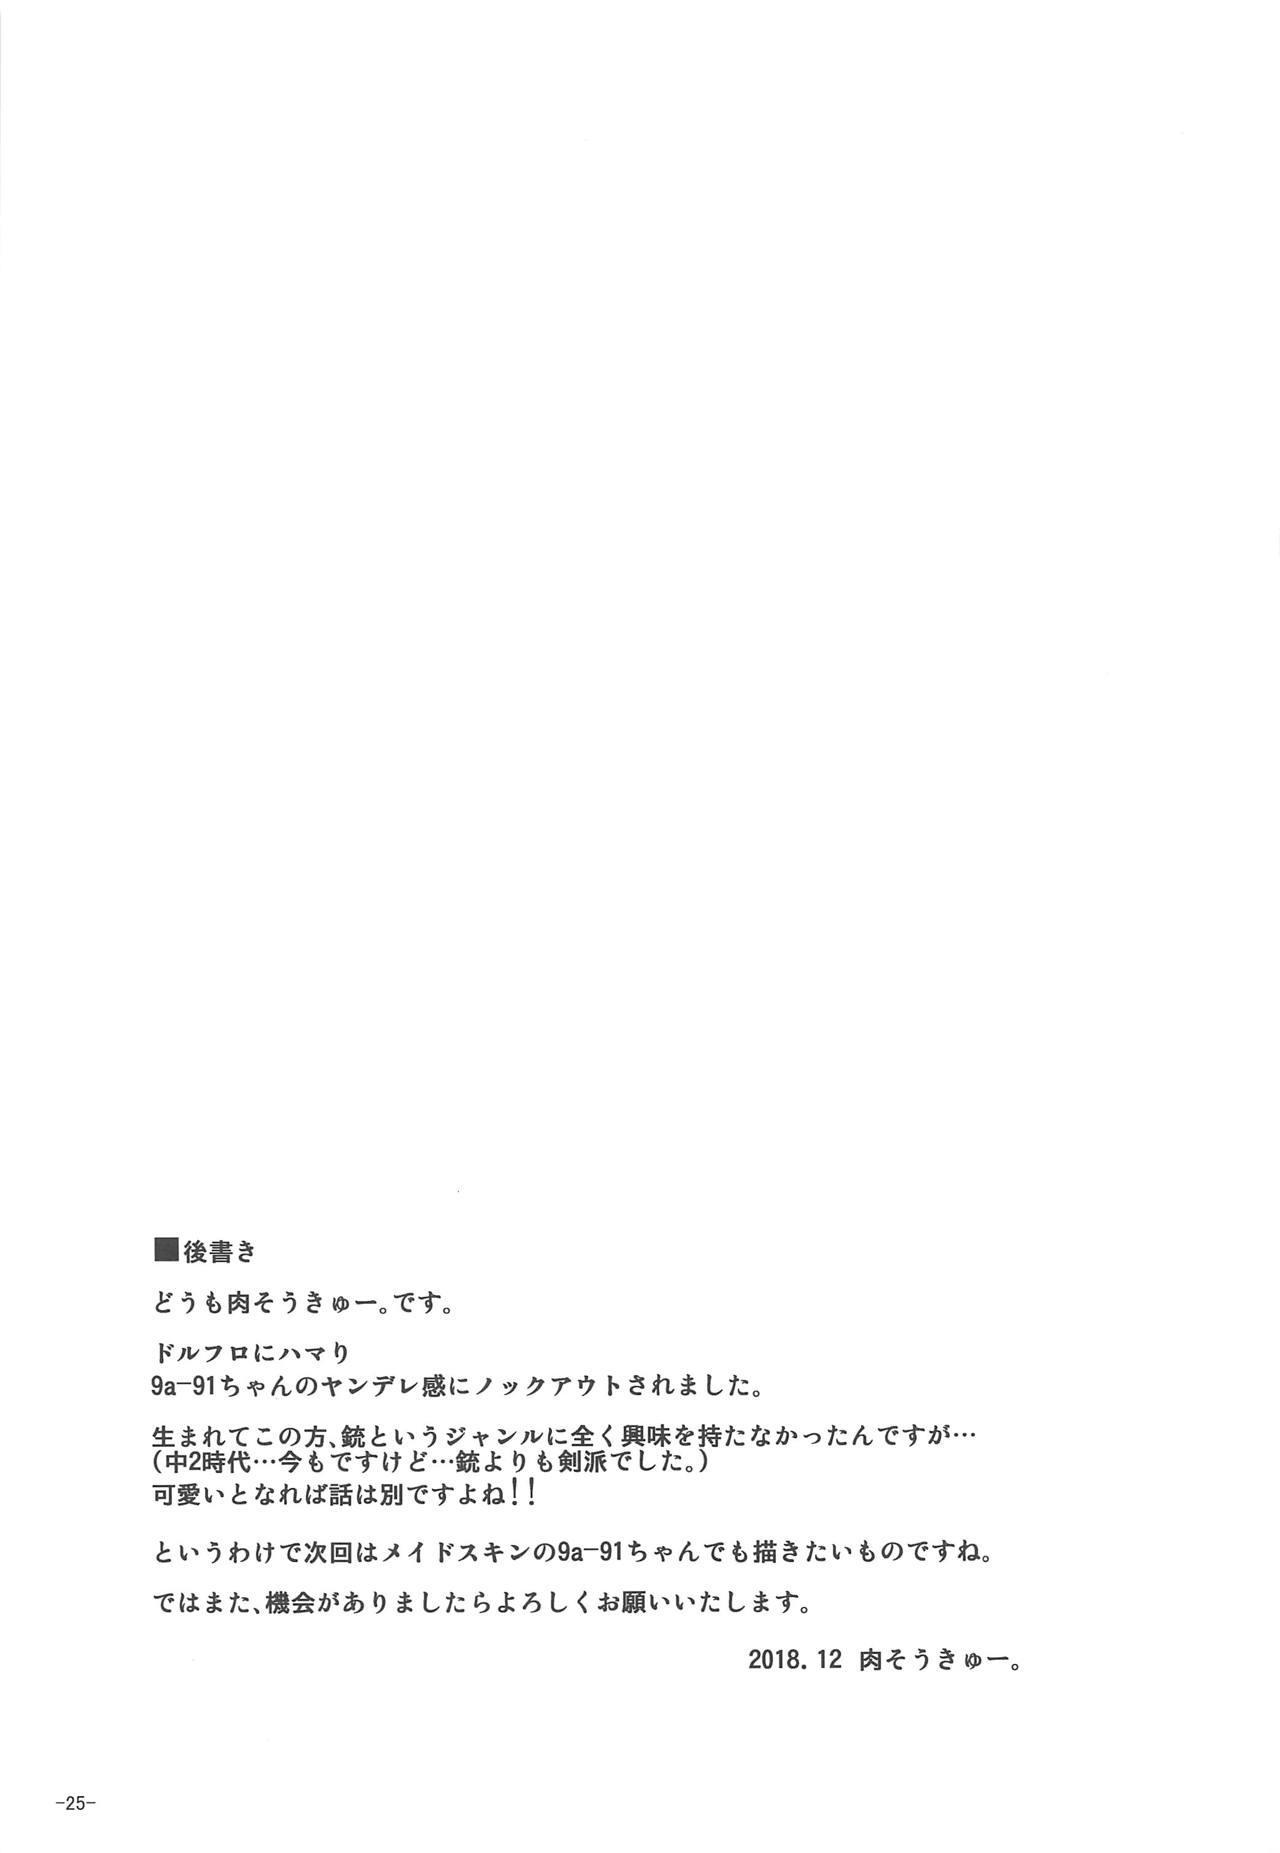 (C95) [Dokomademo Aoi Sora ni Ukabu Niku. (Nikusoukyuu.)] 9a-91-chan wa Miraretai. (Girls' Frontline) [Chinese] [v.v.t.m汉化组] 24